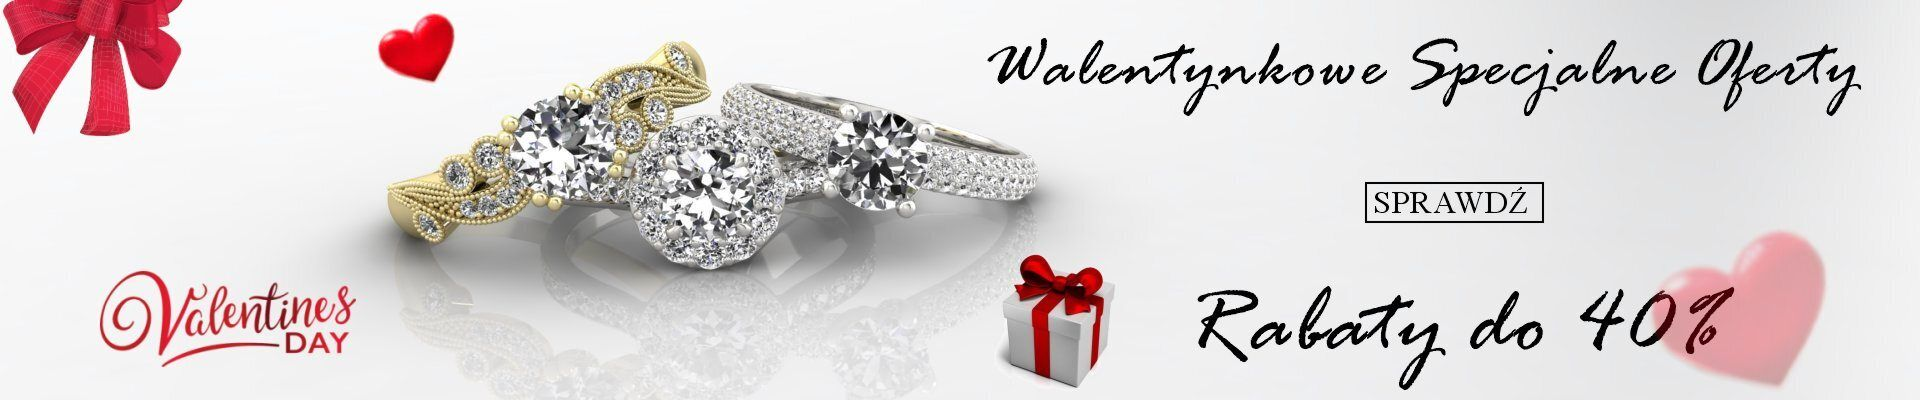 Sklep Jubilerski: do 40% rabatu na biżuterię - prezent na Walentynki